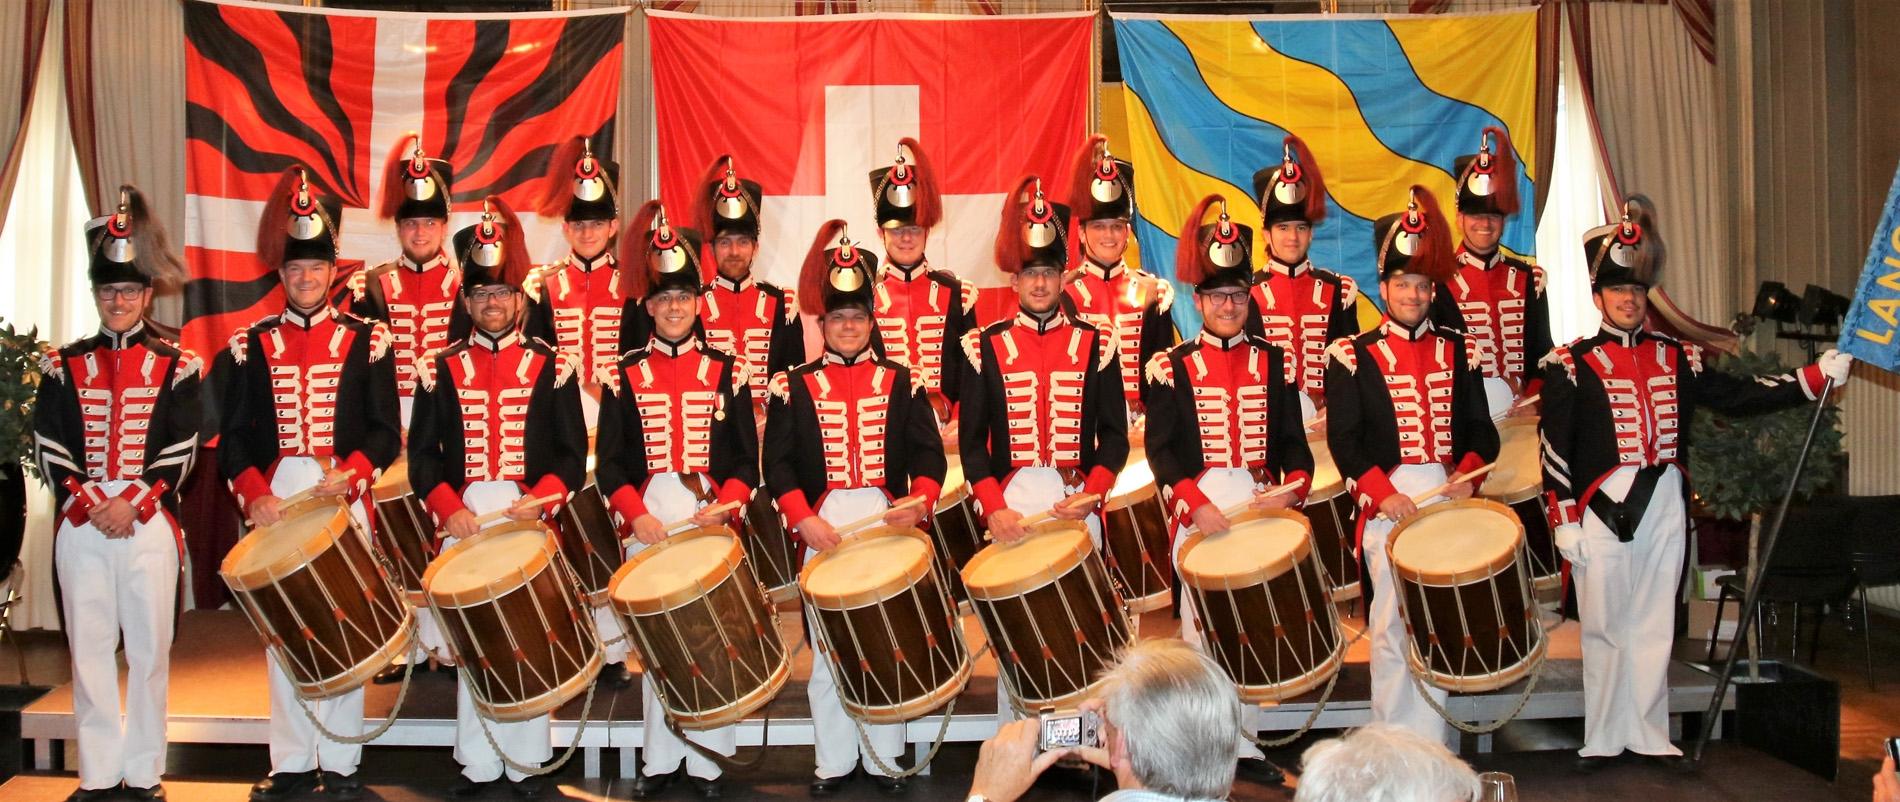 Uniformenfest